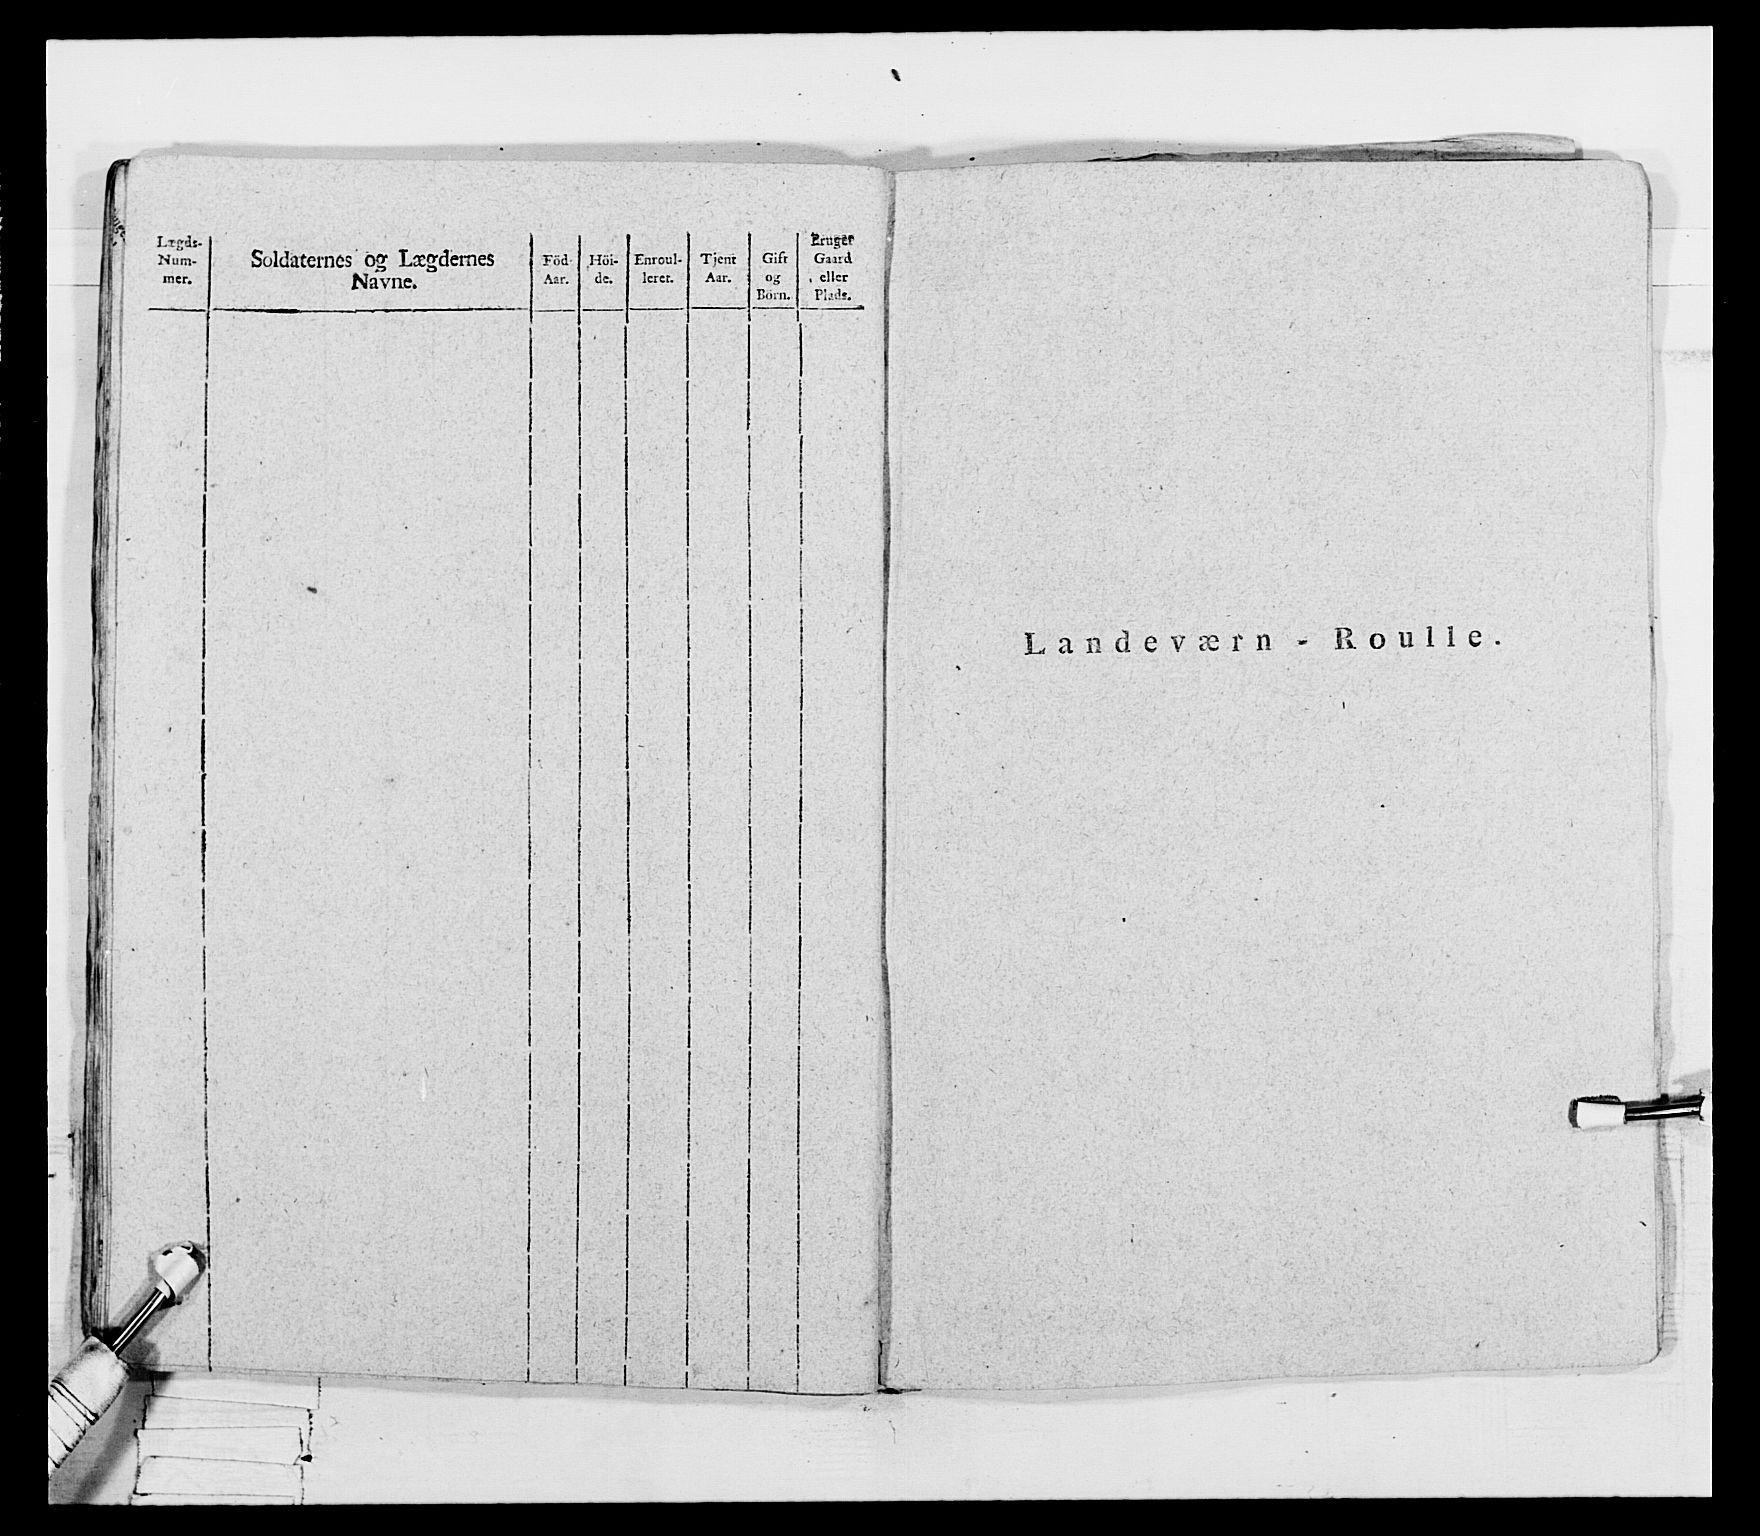 RA, Generalitets- og kommissariatskollegiet, Det kongelige norske kommissariatskollegium, E/Eh/L0069: Opplandske gevorbne infanteriregiment, 1810-1818, p. 191